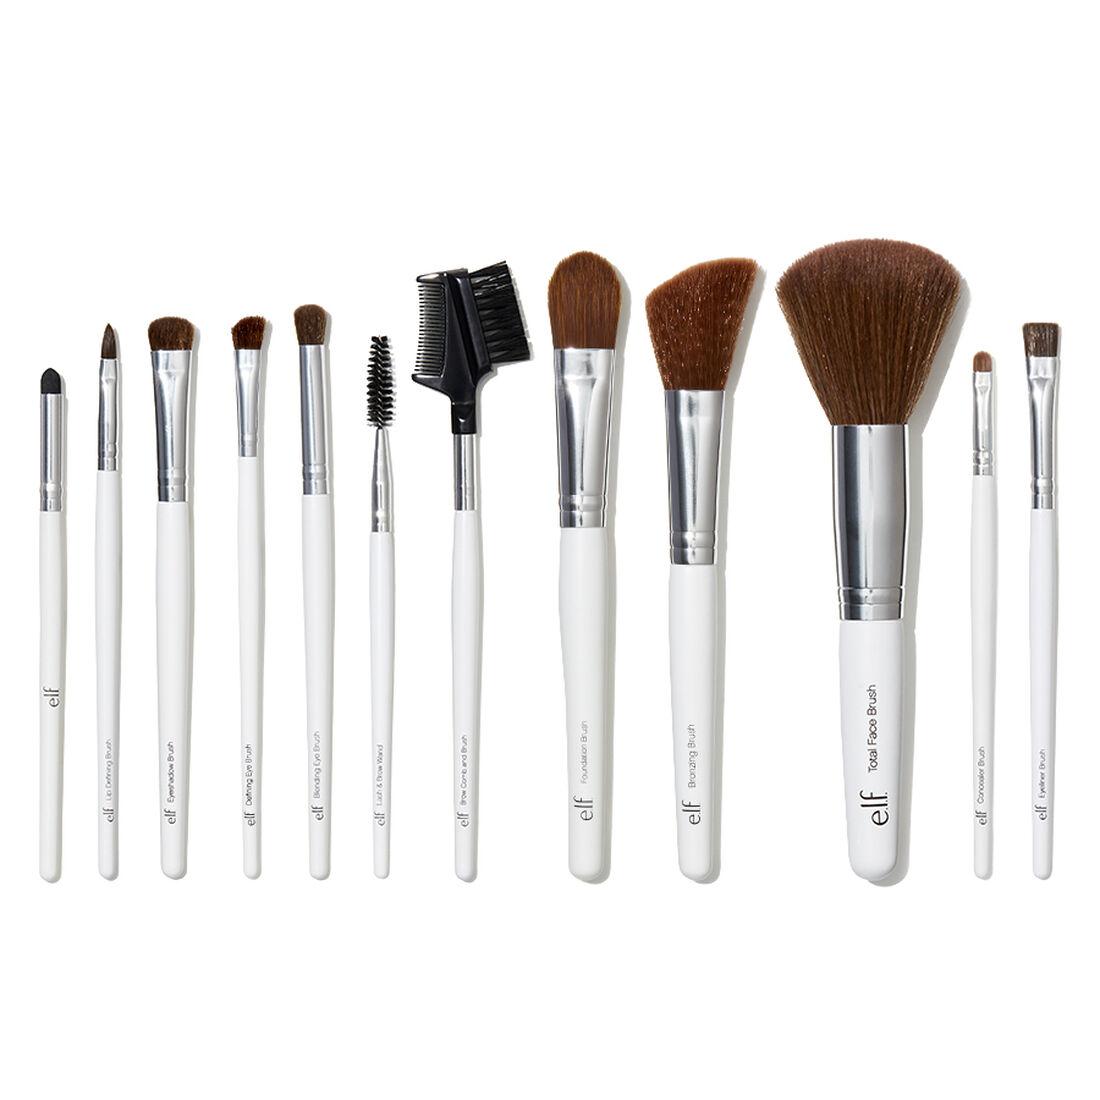 E.l.f. - Professional Set of 12 Brushes